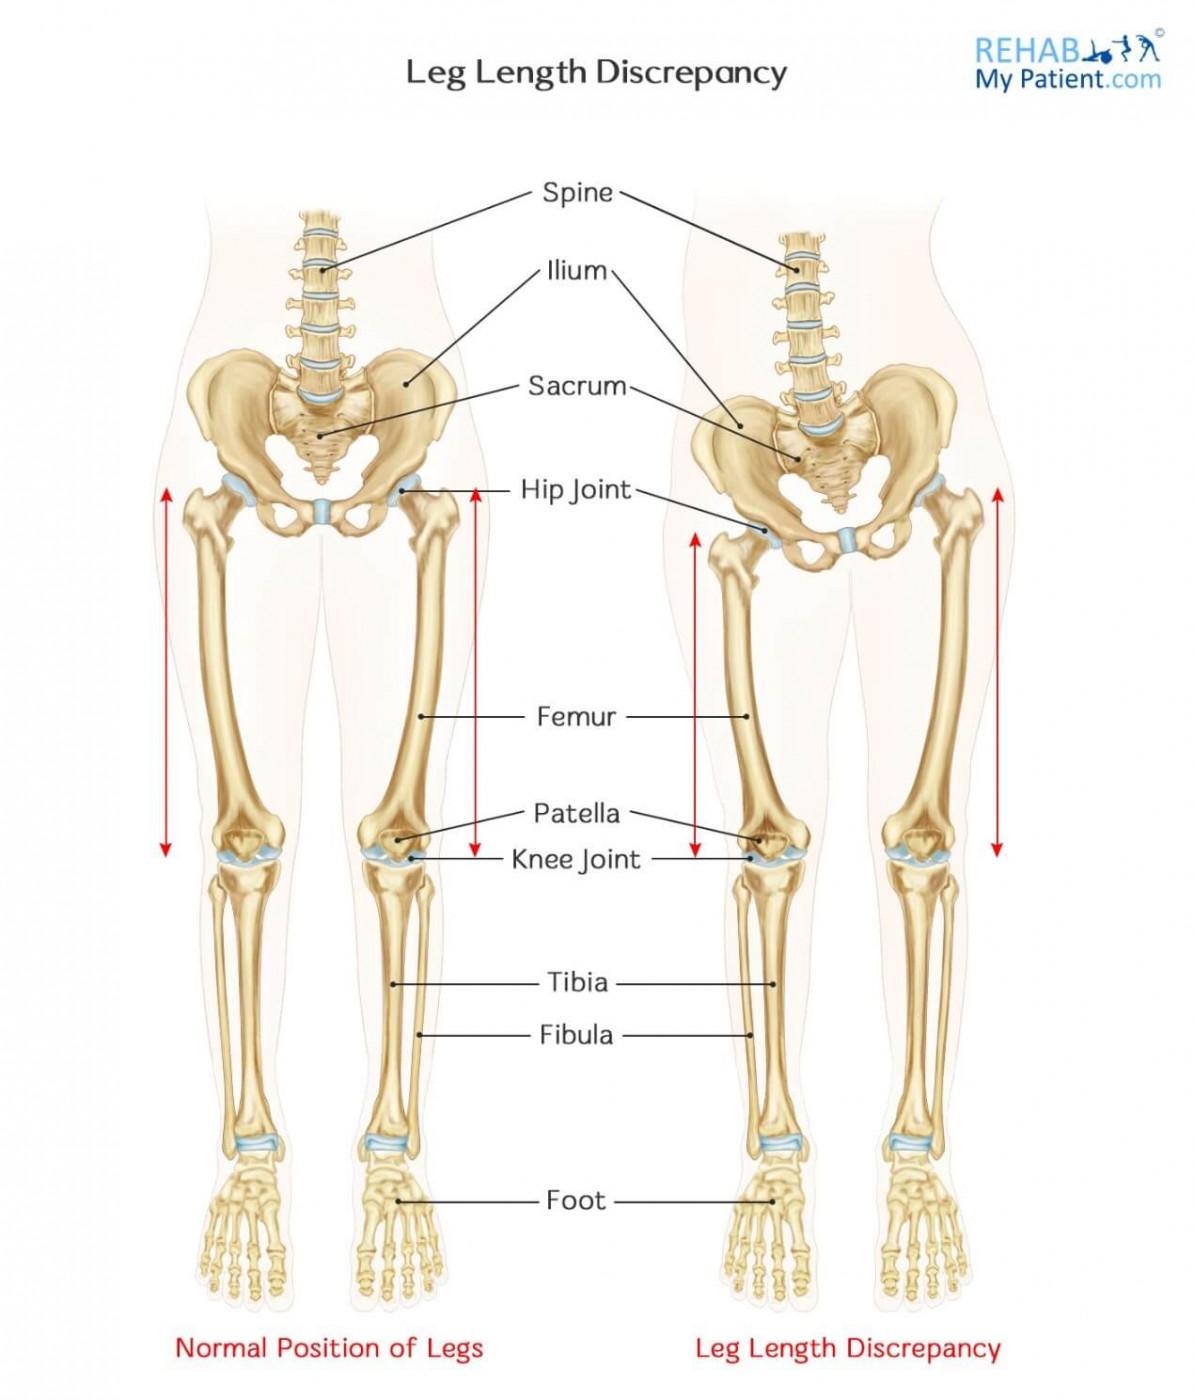 Leg Length Discrepancy | Rehab My Patient